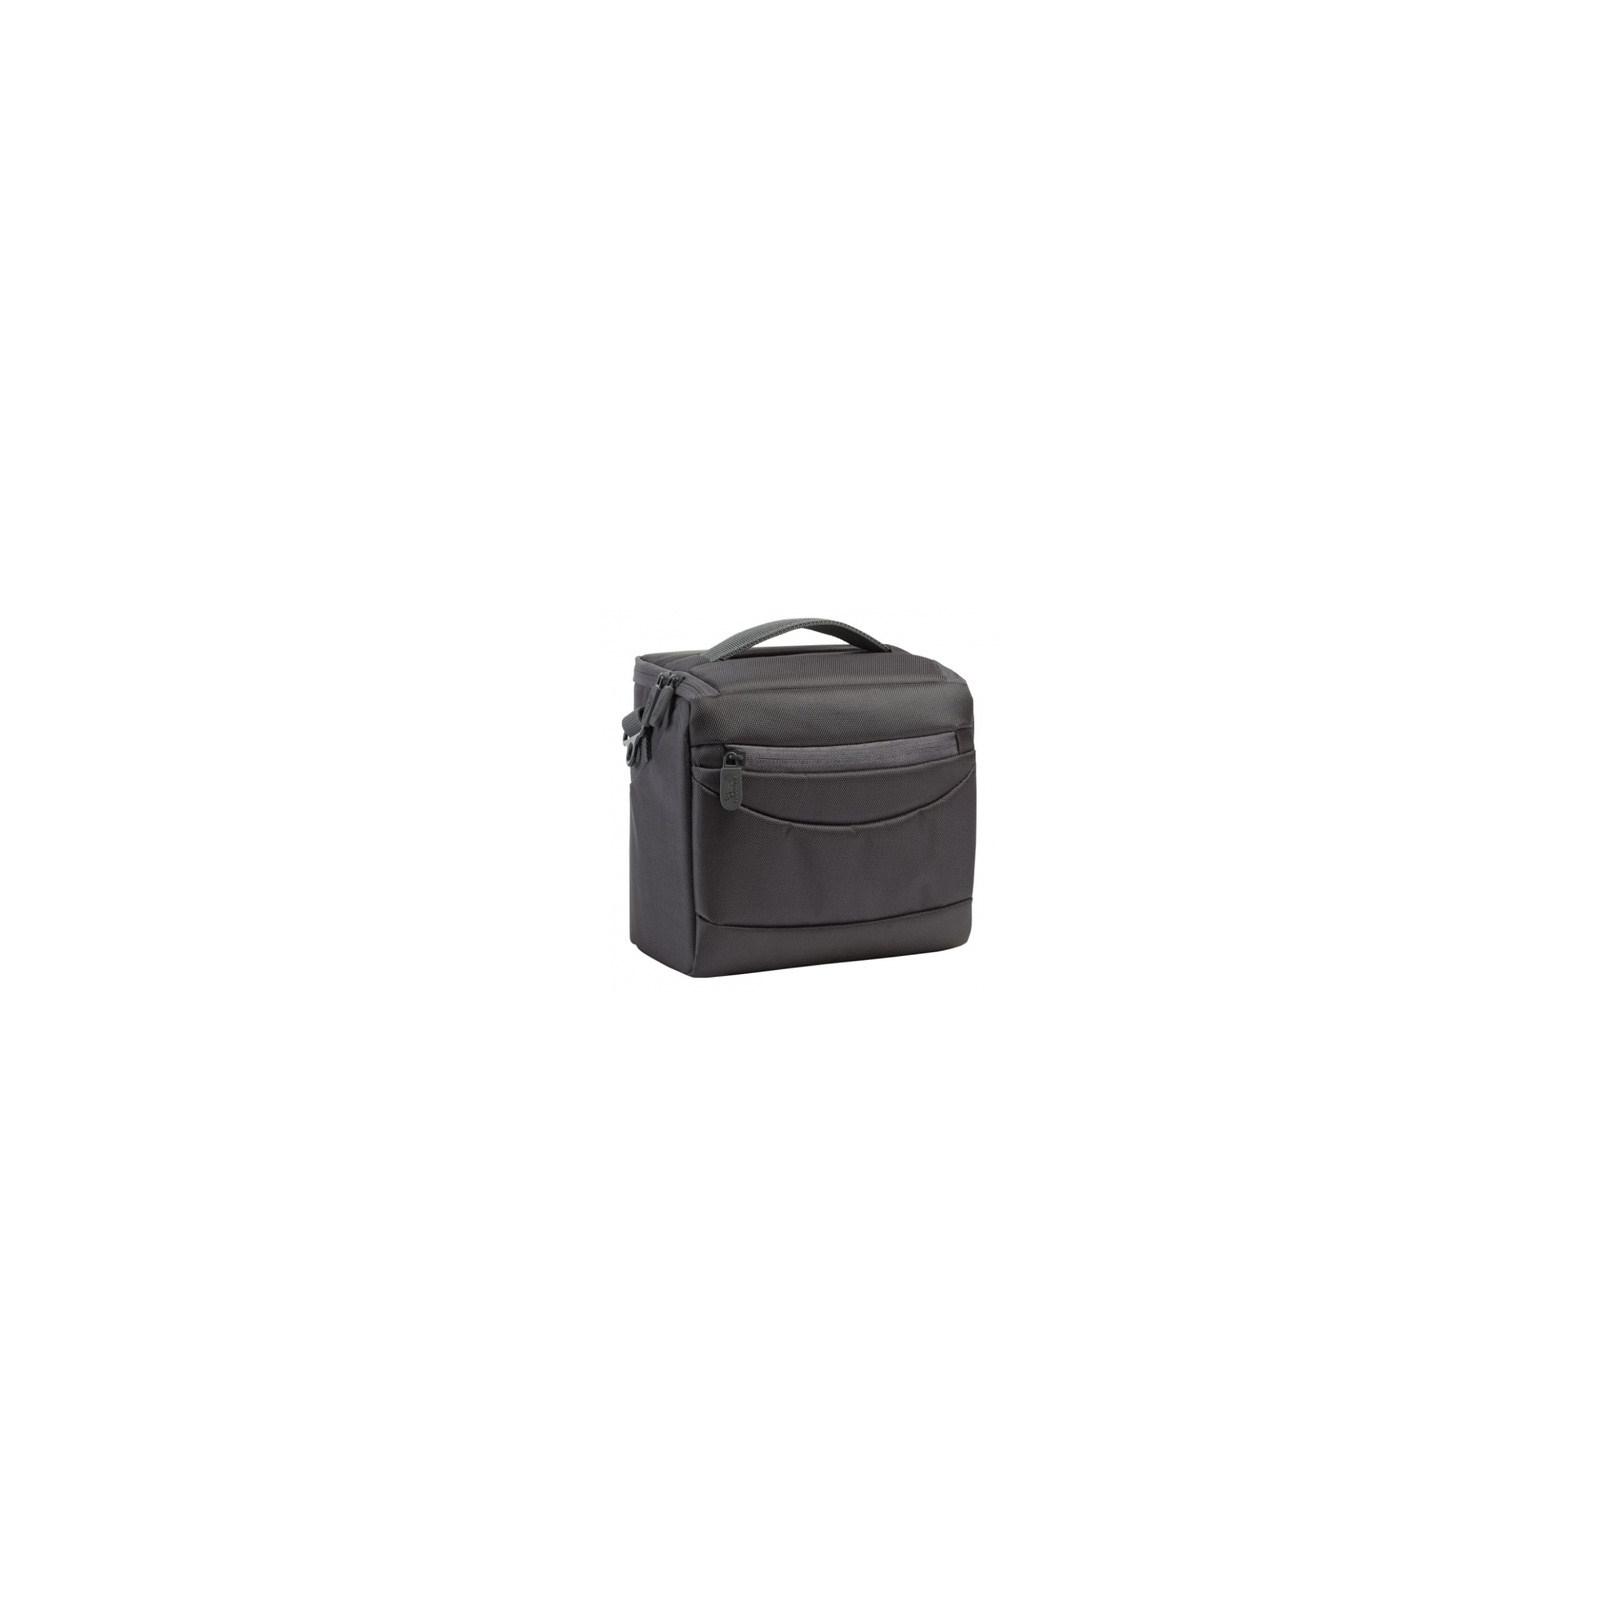 Фото-сумка RivaCase SLR Case (7218NL Grey)